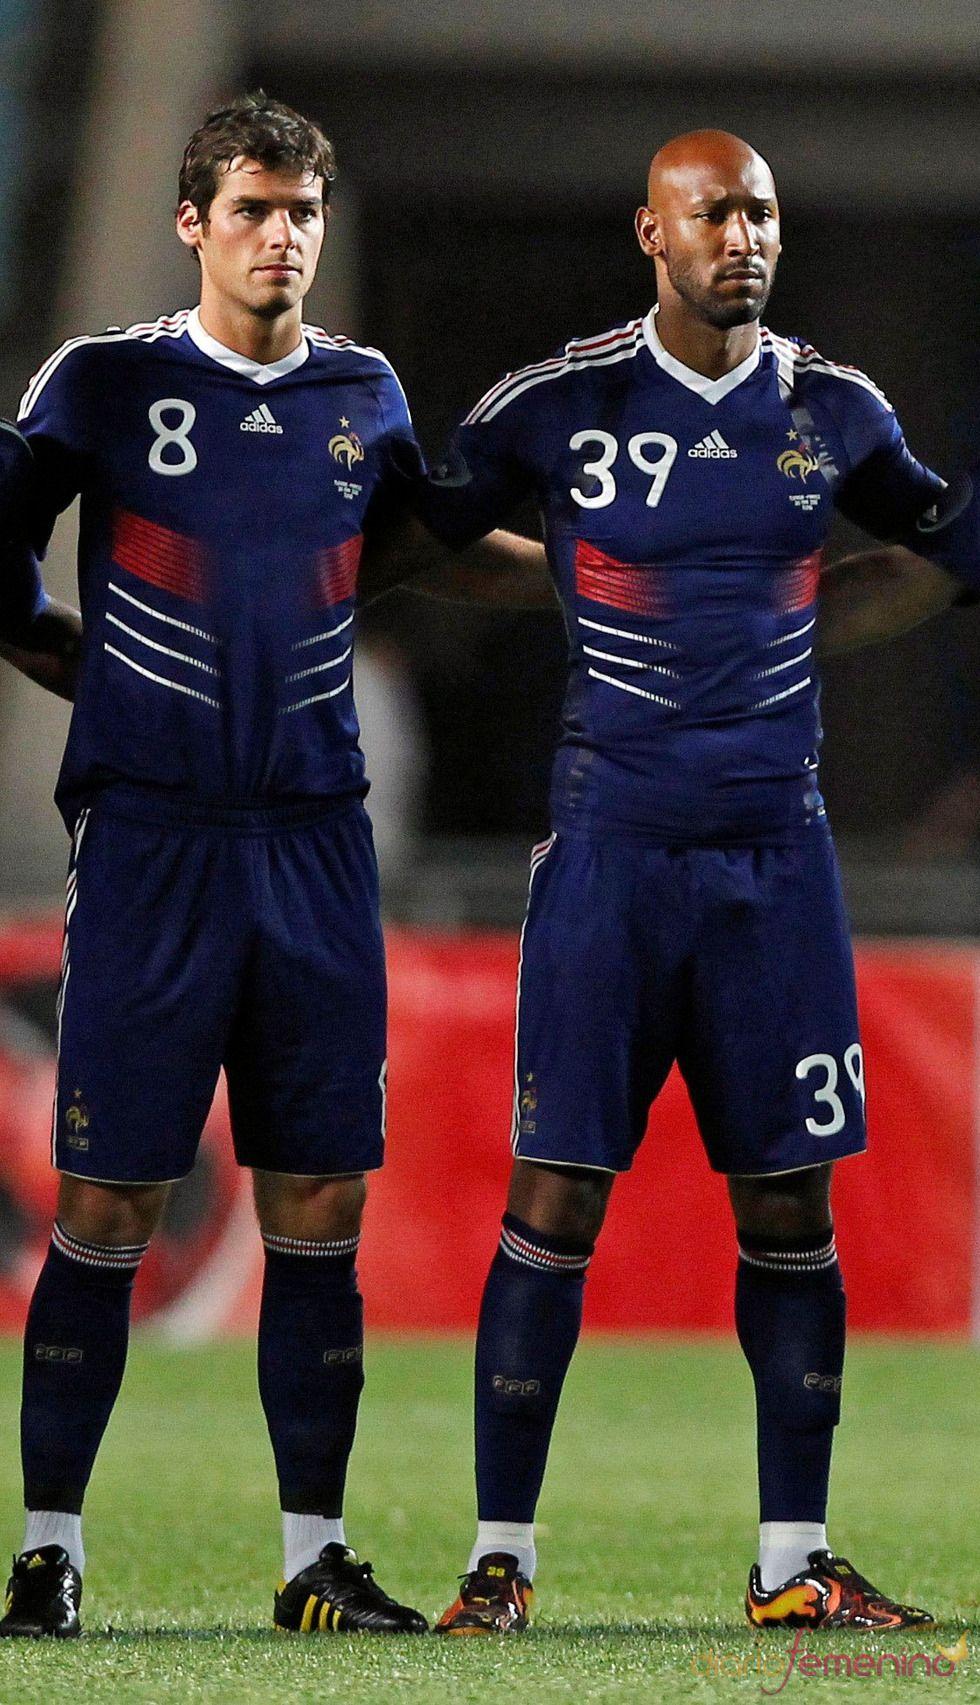 Match coronó World Stars-yoann gourcuff-Francia